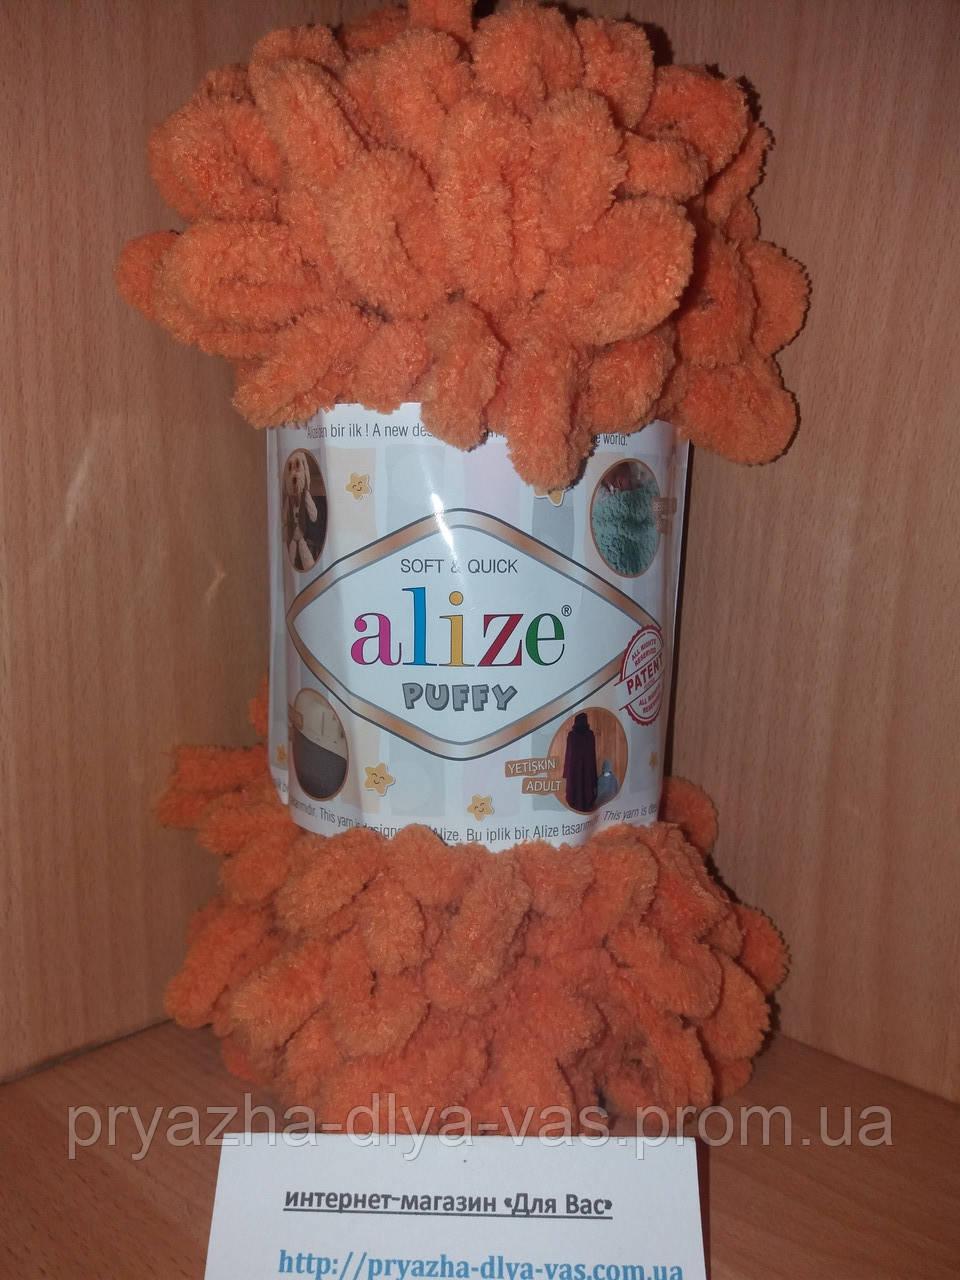 Пряжа для вязания руками (100%-микрополиэстер, 100г/9,2м) Alize PUFFY 336 (оранжевый)